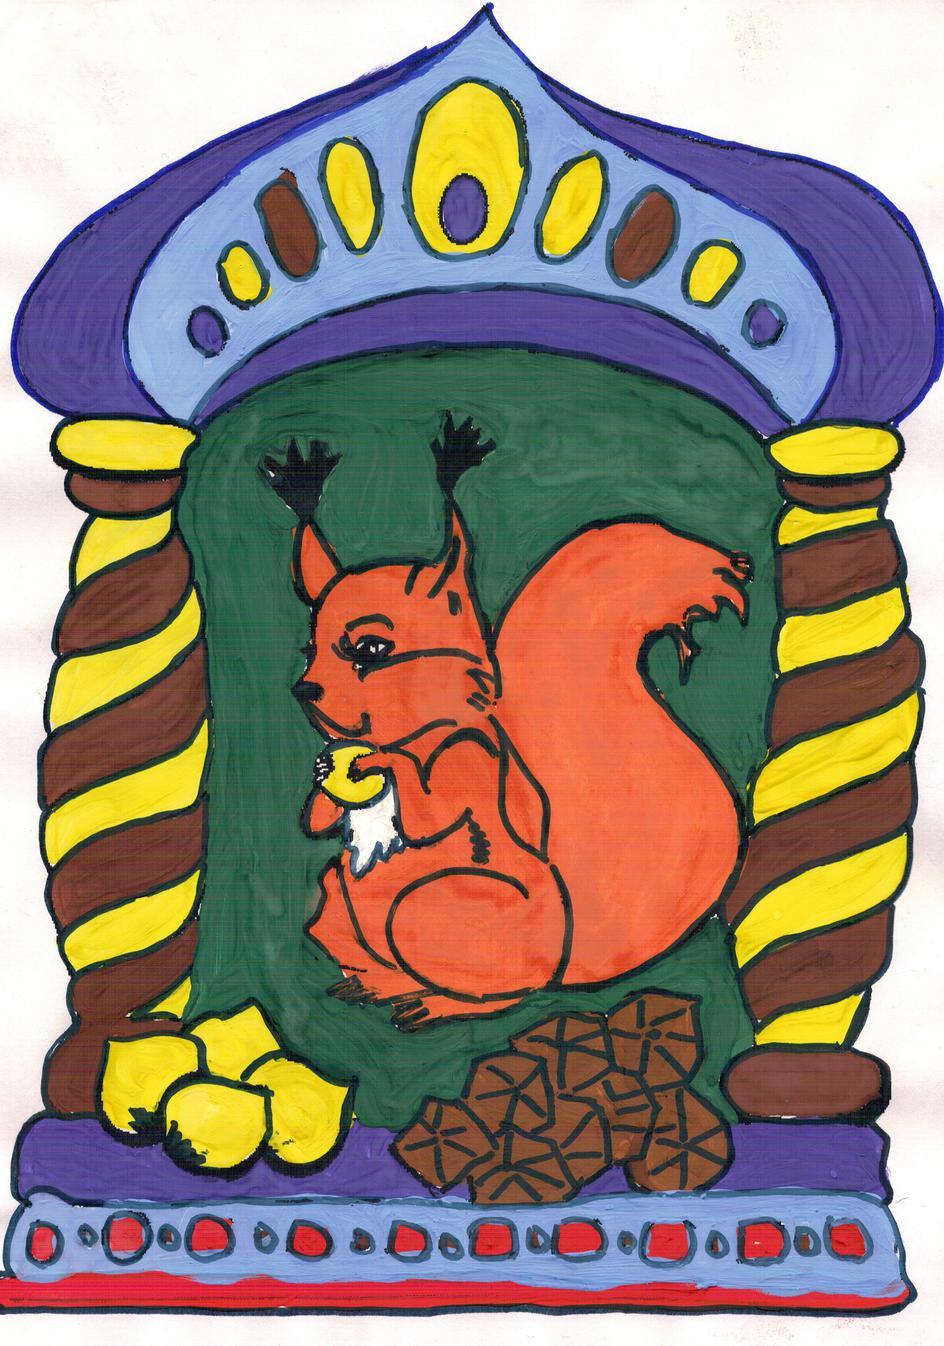 белки из сказки о царе салтане рисунок